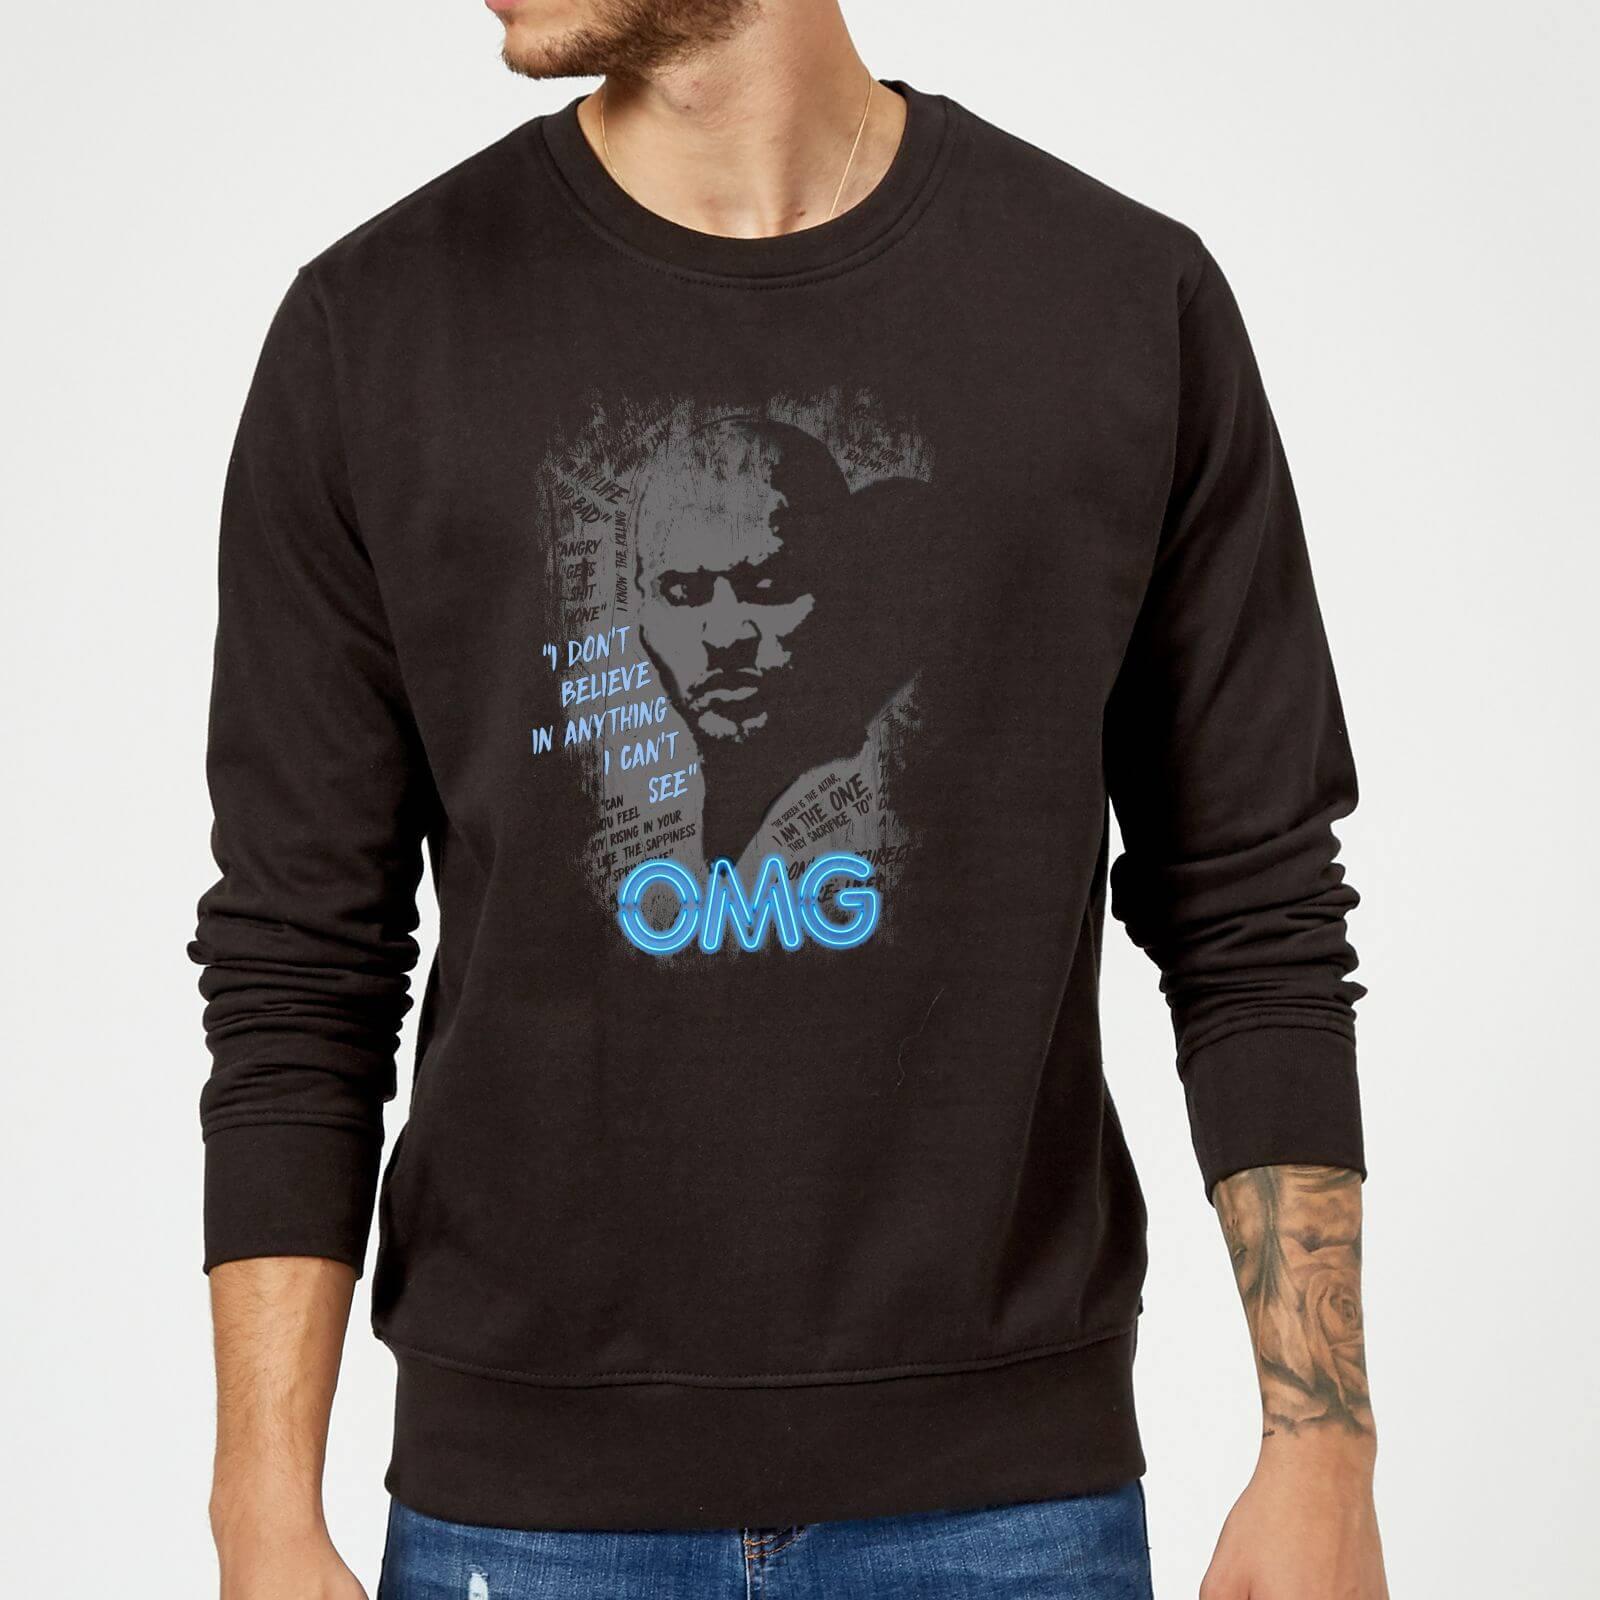 American Gods Shadow OMG Sweatshirt - Black - XL - Black